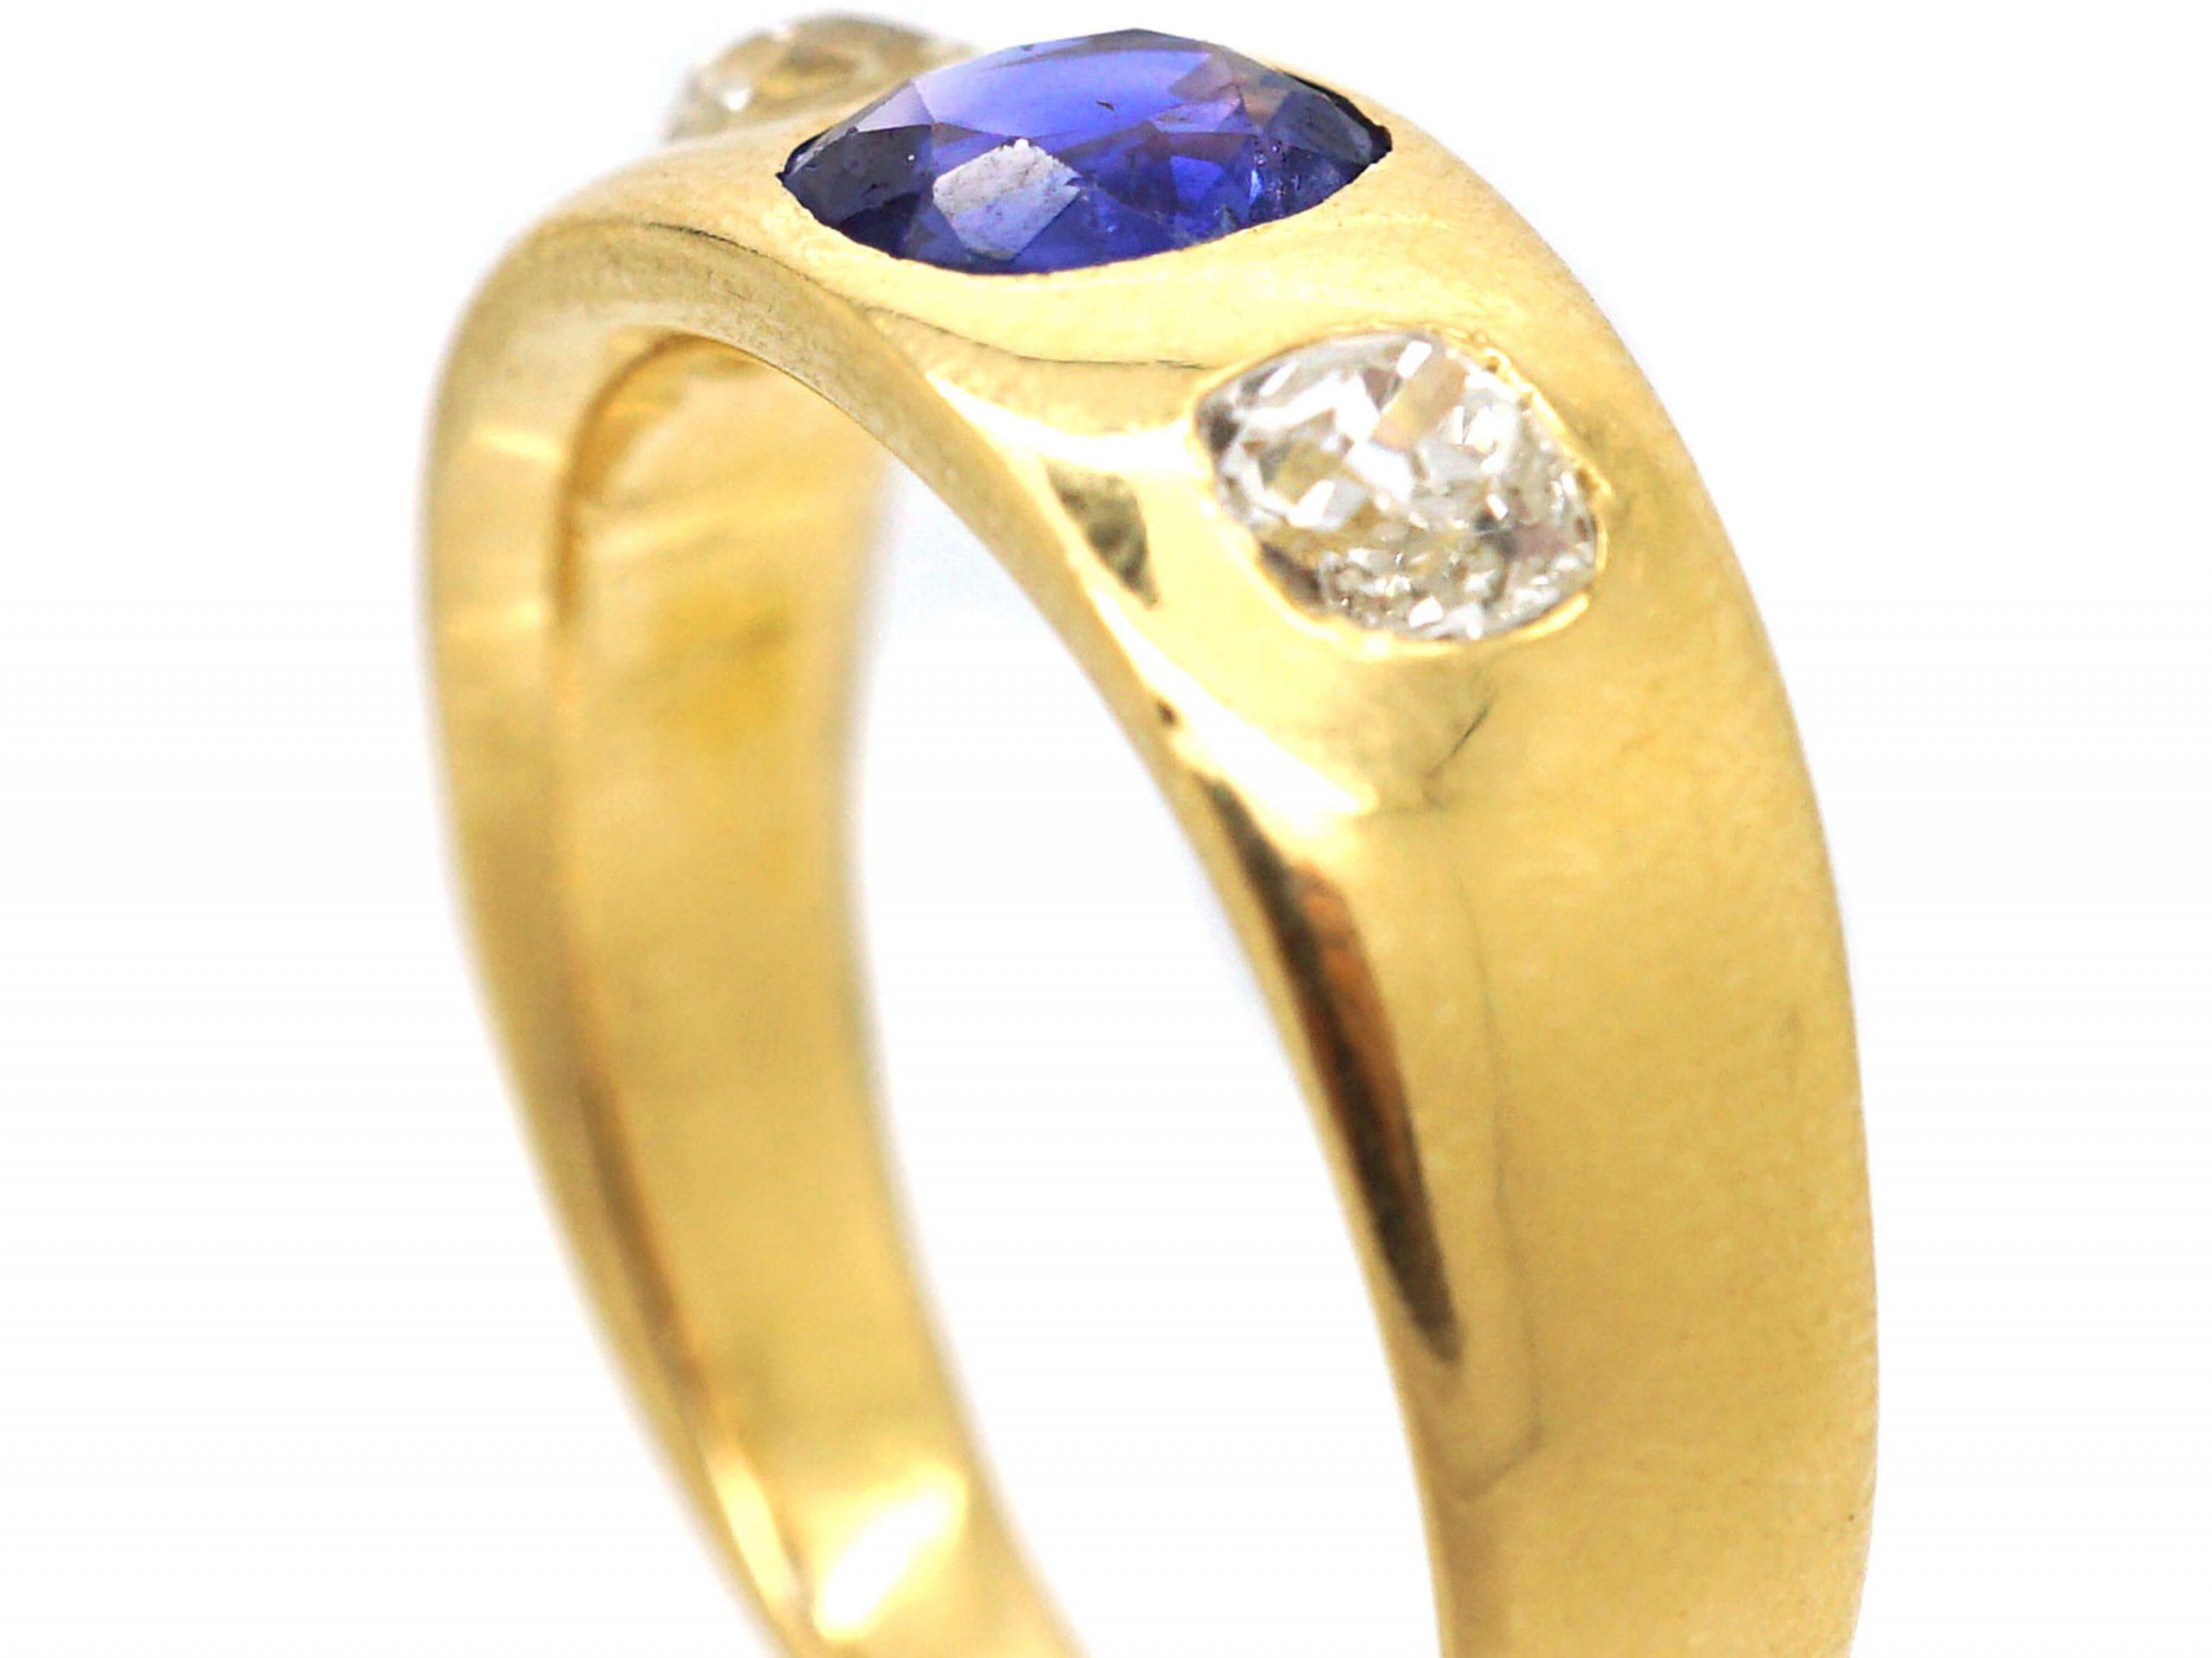 Edwardian 18ct Gold, Sapphire & Diamond Rub Over Set Ring